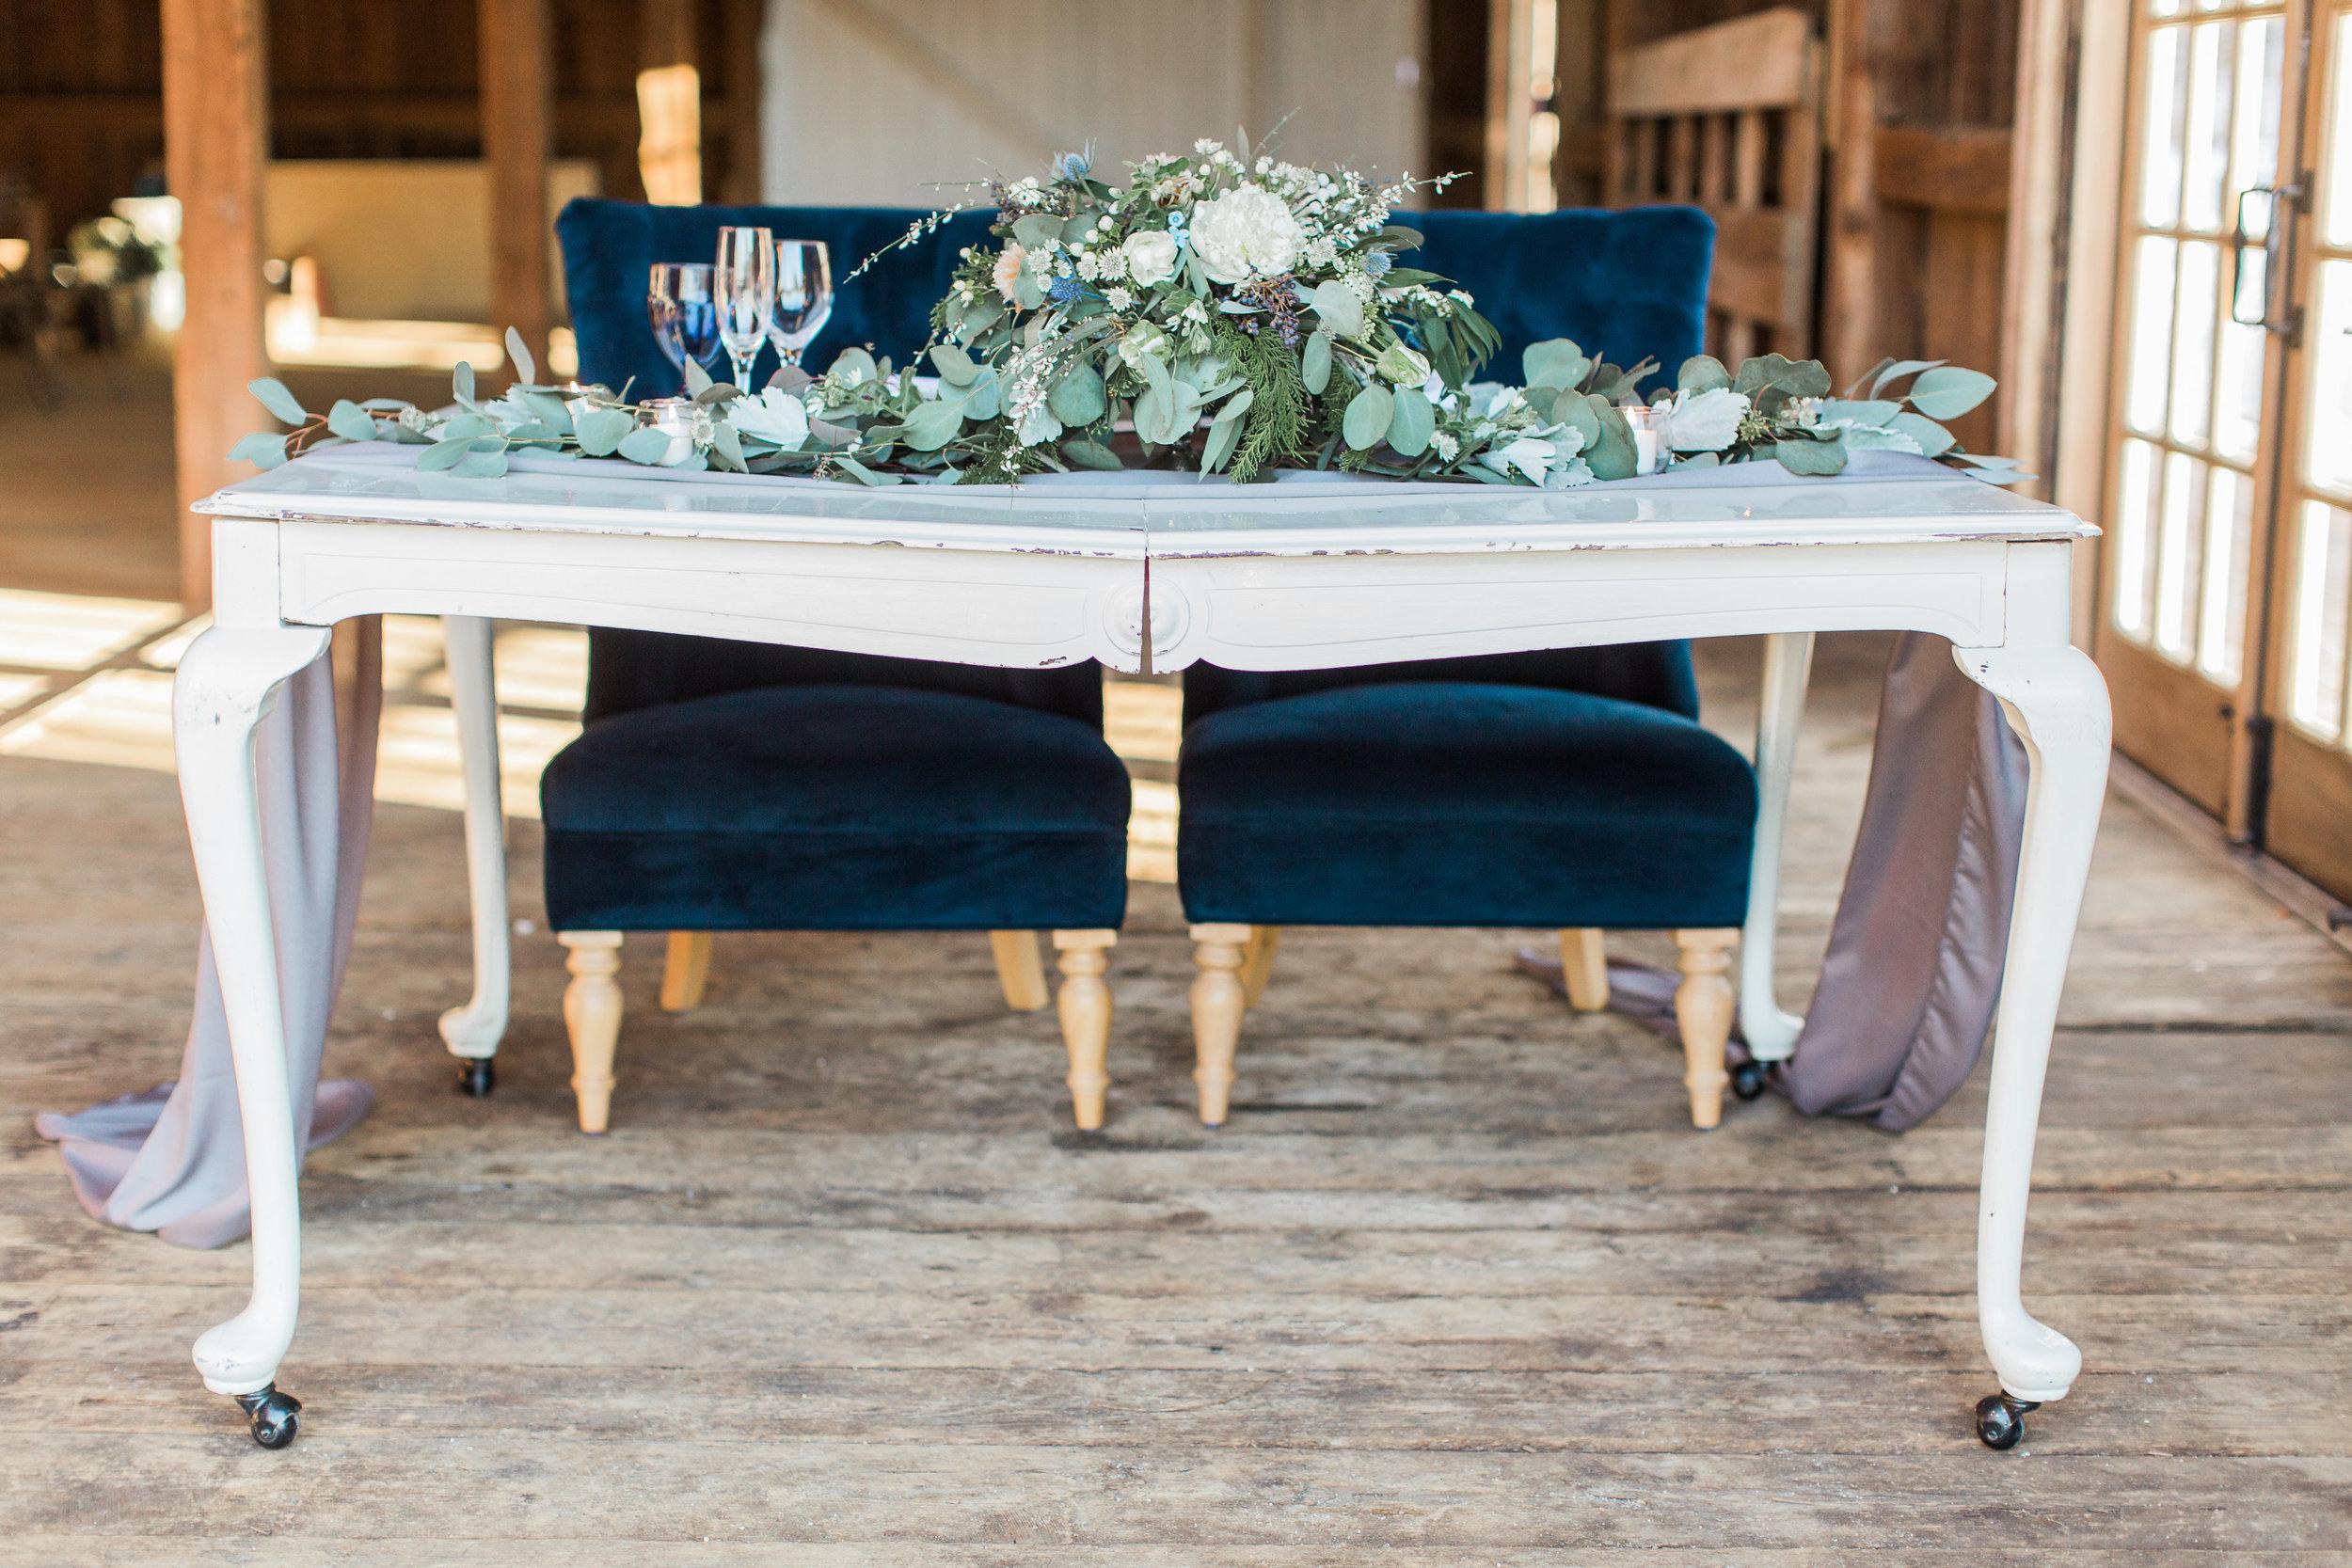 Cunningham_Farm_Winter_Styled_Wedding_Shoot_Meredith_Jane_Photography-153.jpg